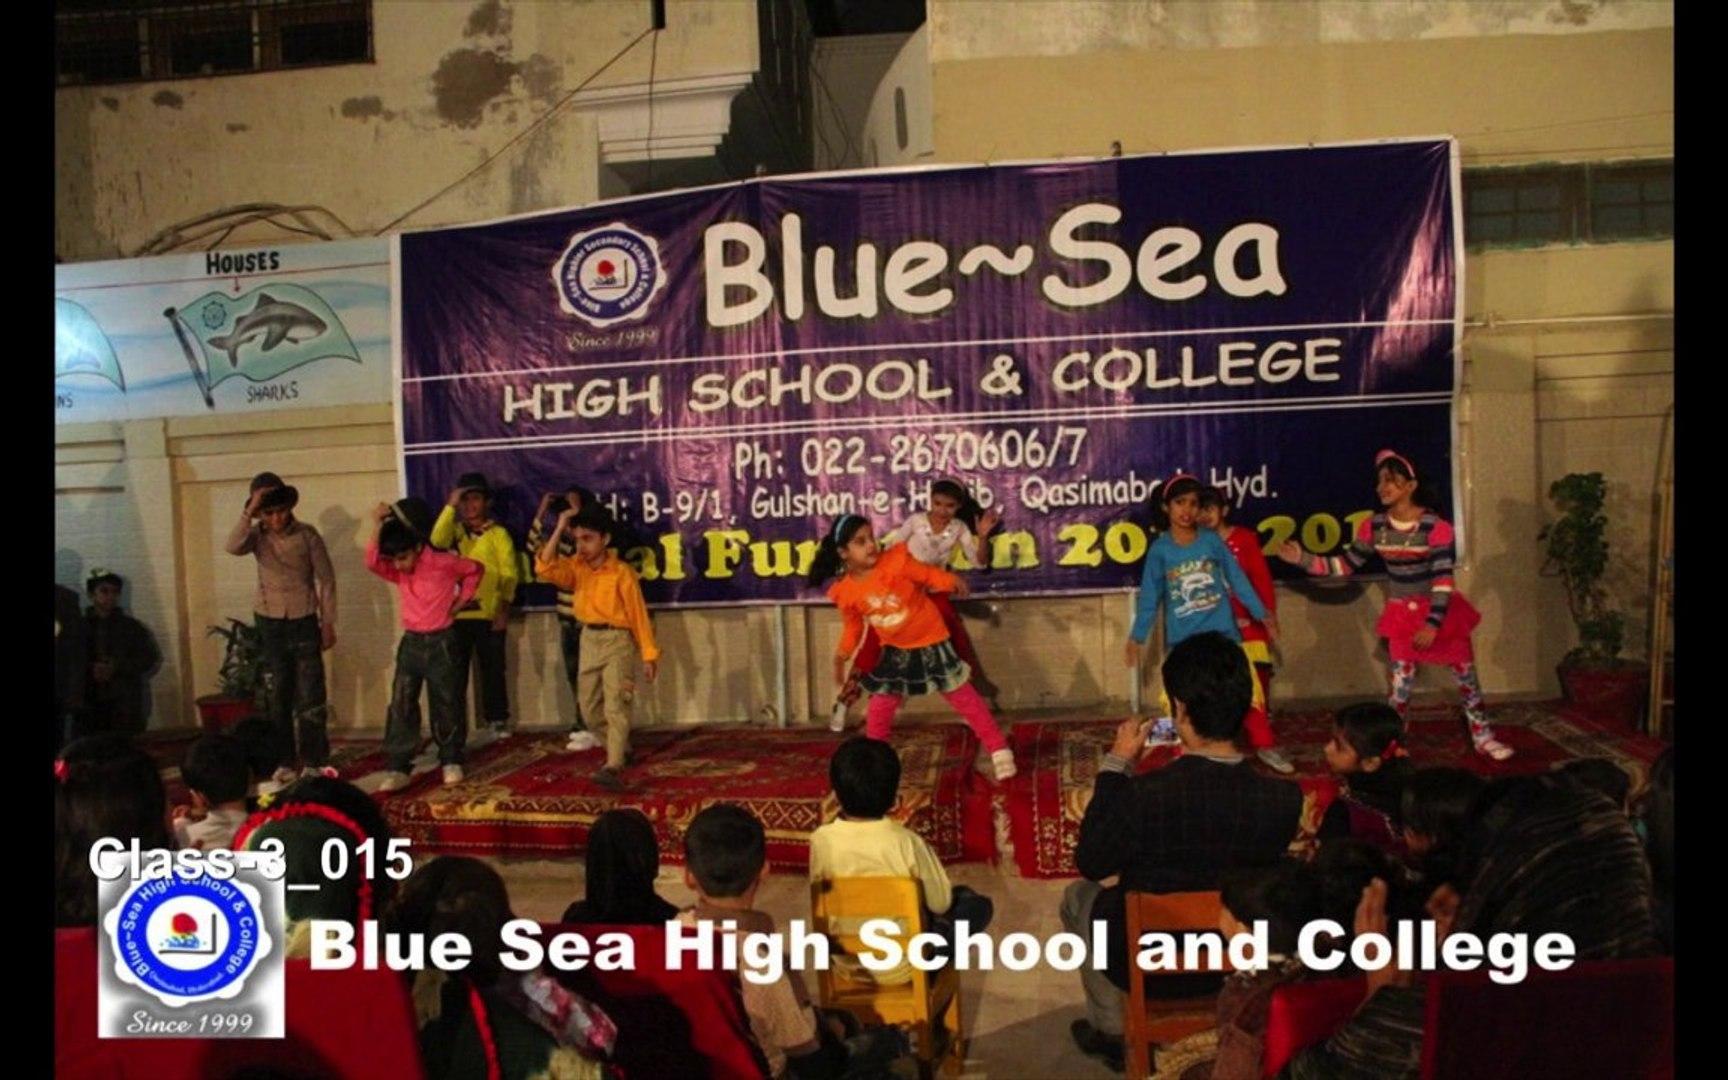 Blue Sea High School and College Class-3  jailhouse break elvis presley